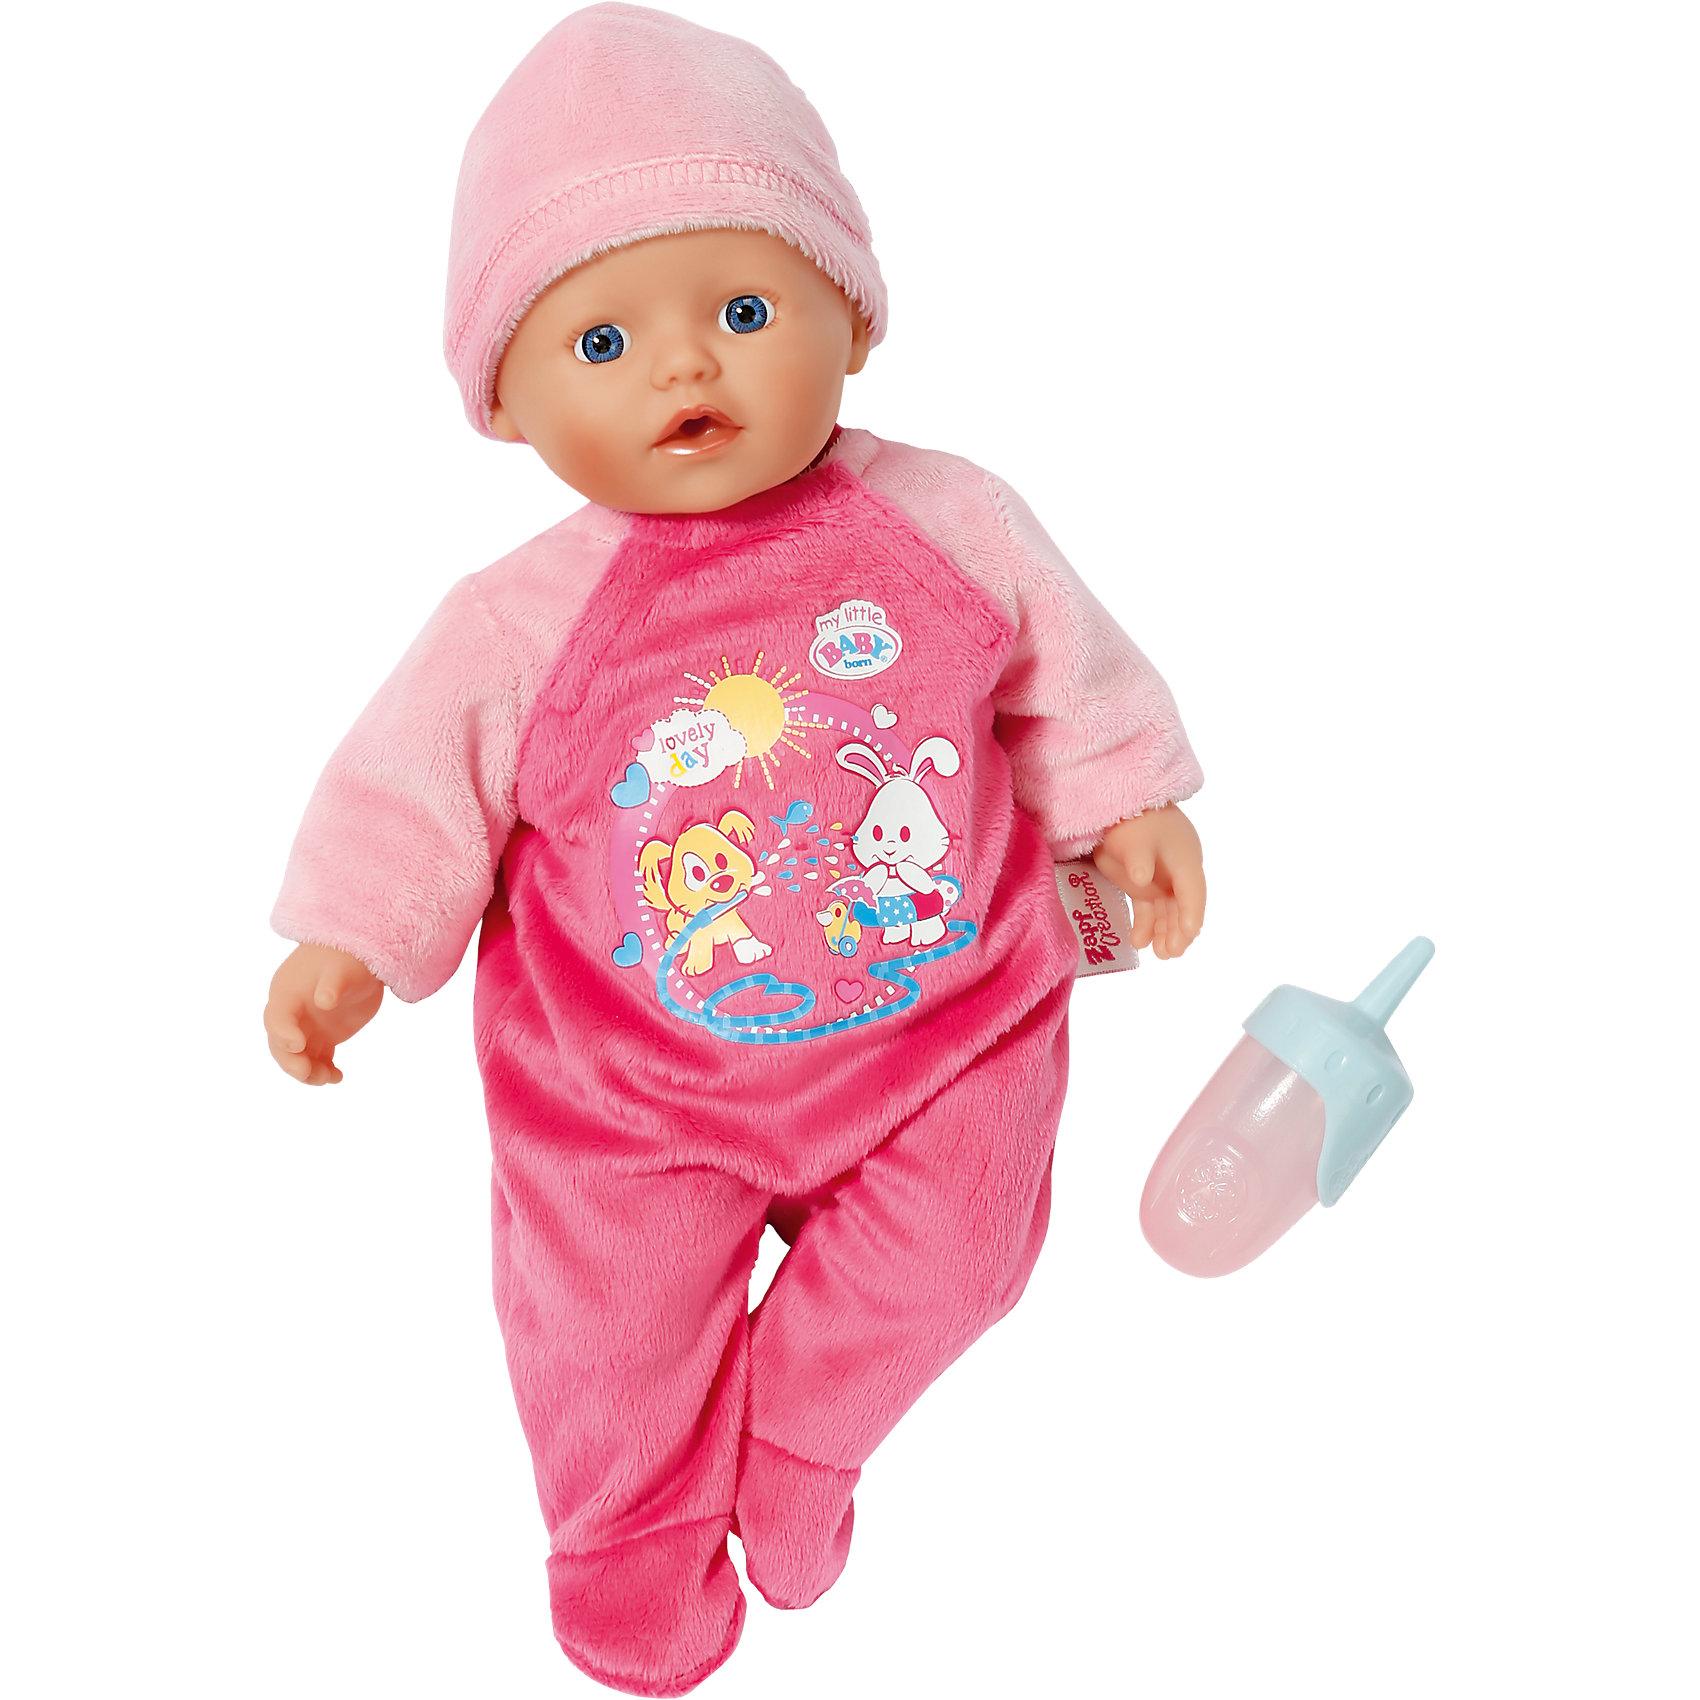 Zapf Creation Кукла быстросохнущая, 32 см, my little BABY born беби борн недорого зимняя красавица